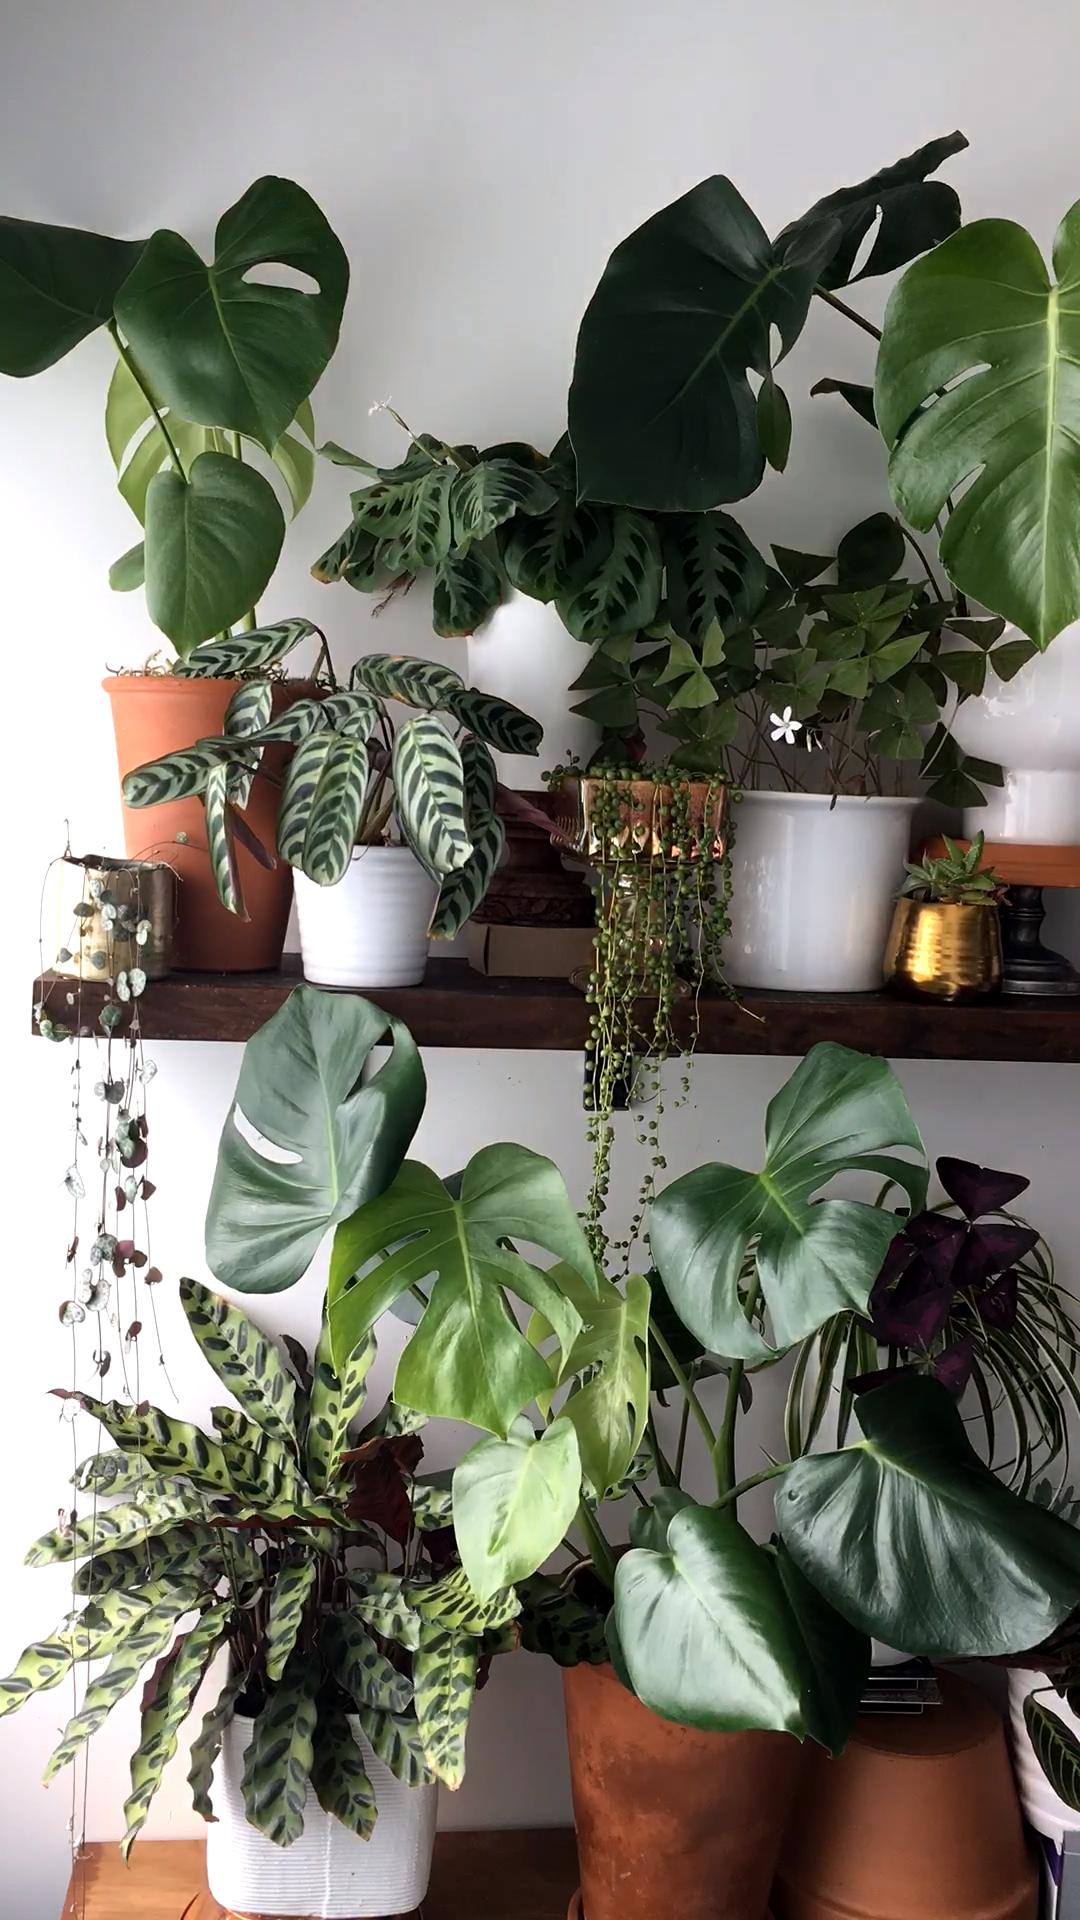 Monstera plant unfurls new leaves - time-lapse video #beautifulnature